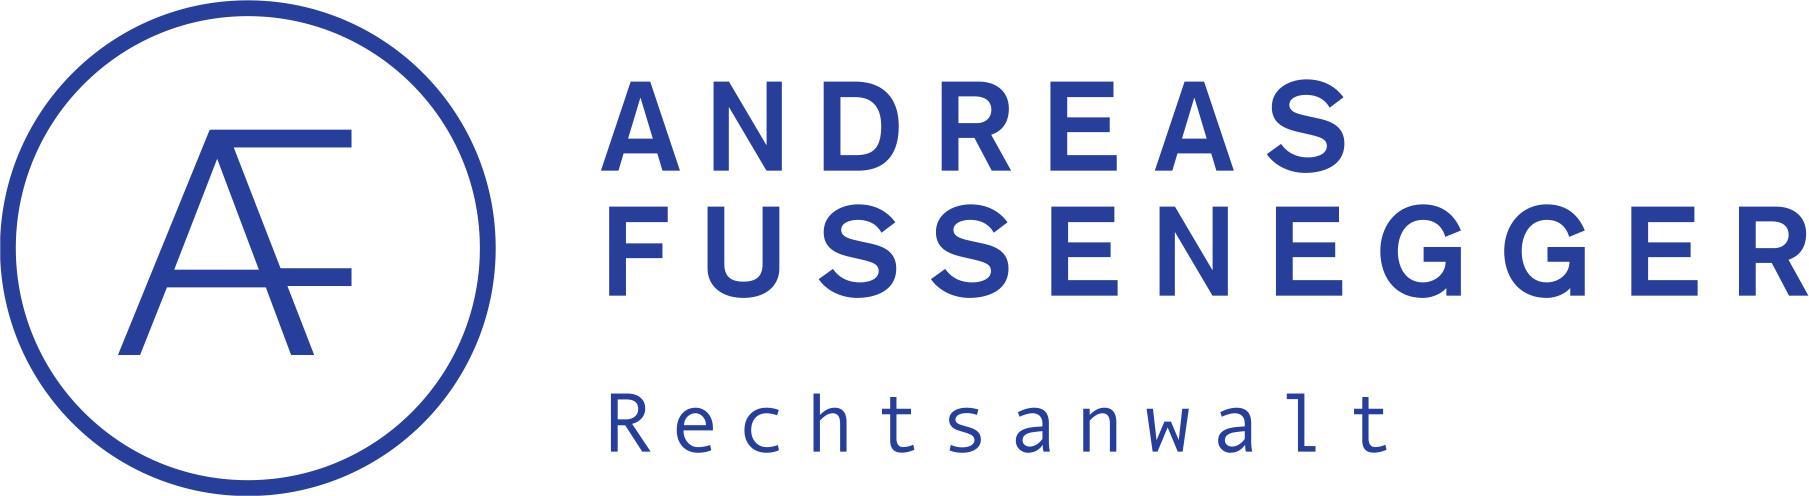 Dr. Andreas Fussenegger Logo Dornbirn